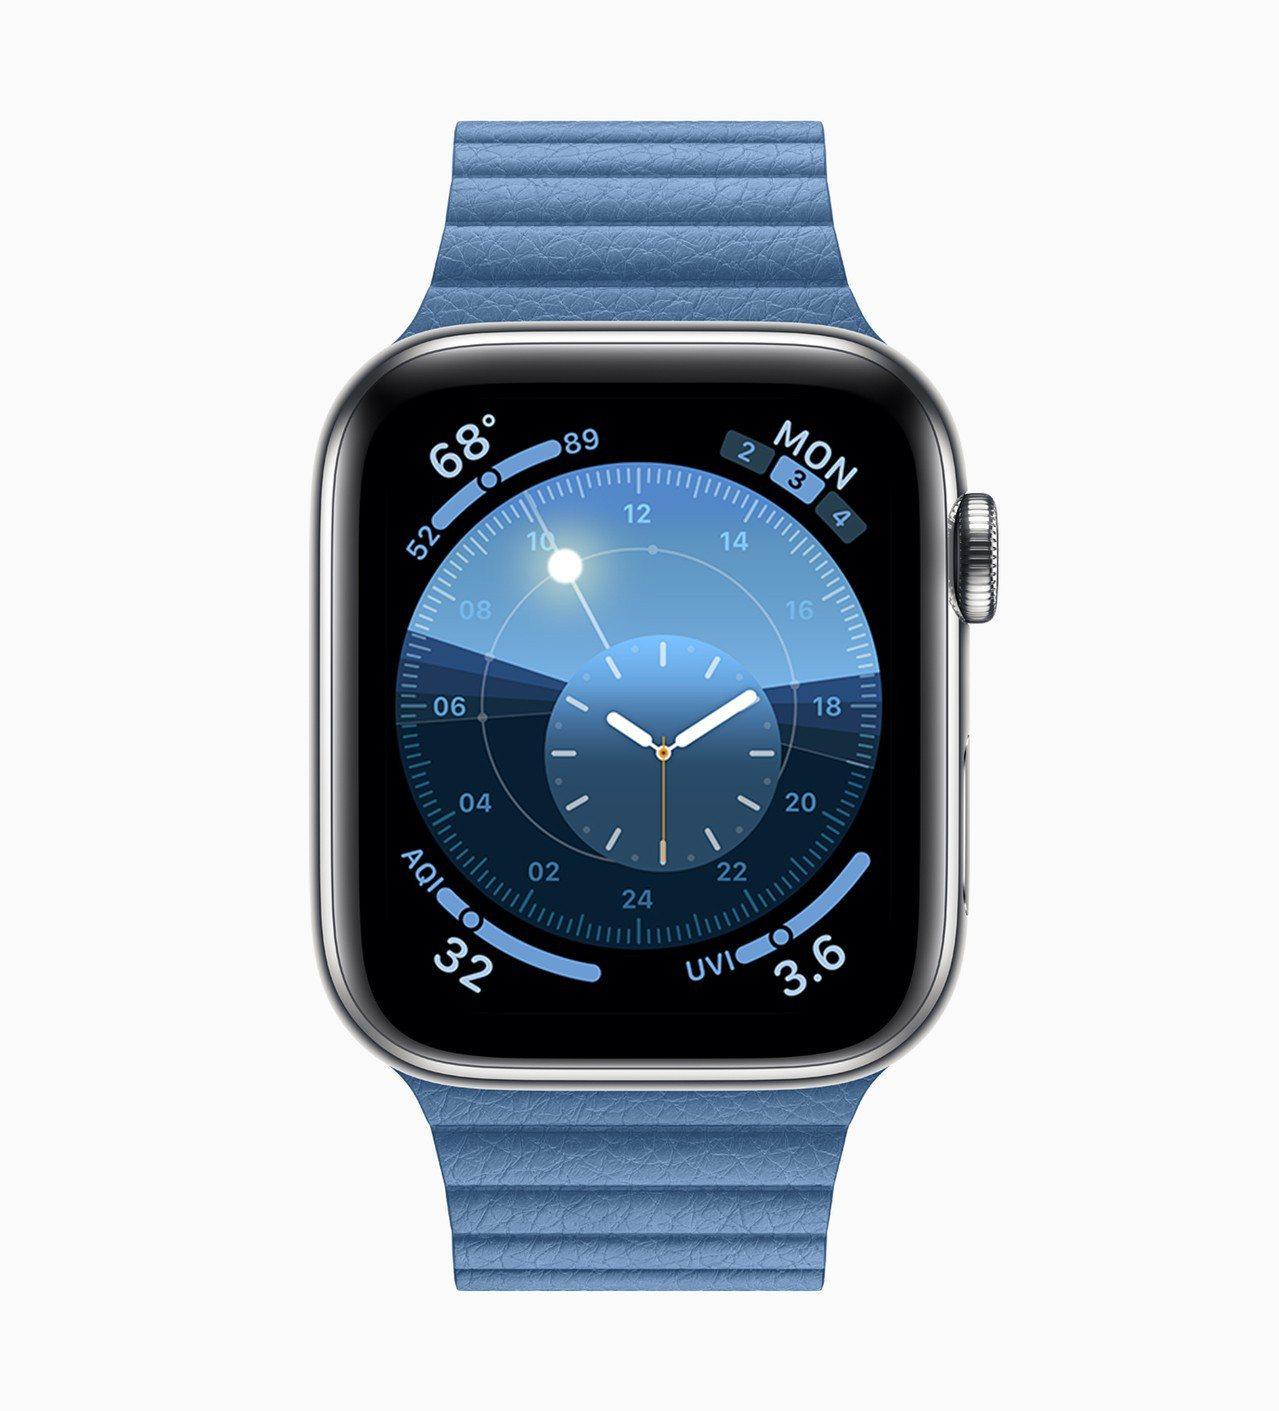 watchOS 6上大幅更新了健康和健身功能,表盤圖樣也有新增。圖/蘋果提供